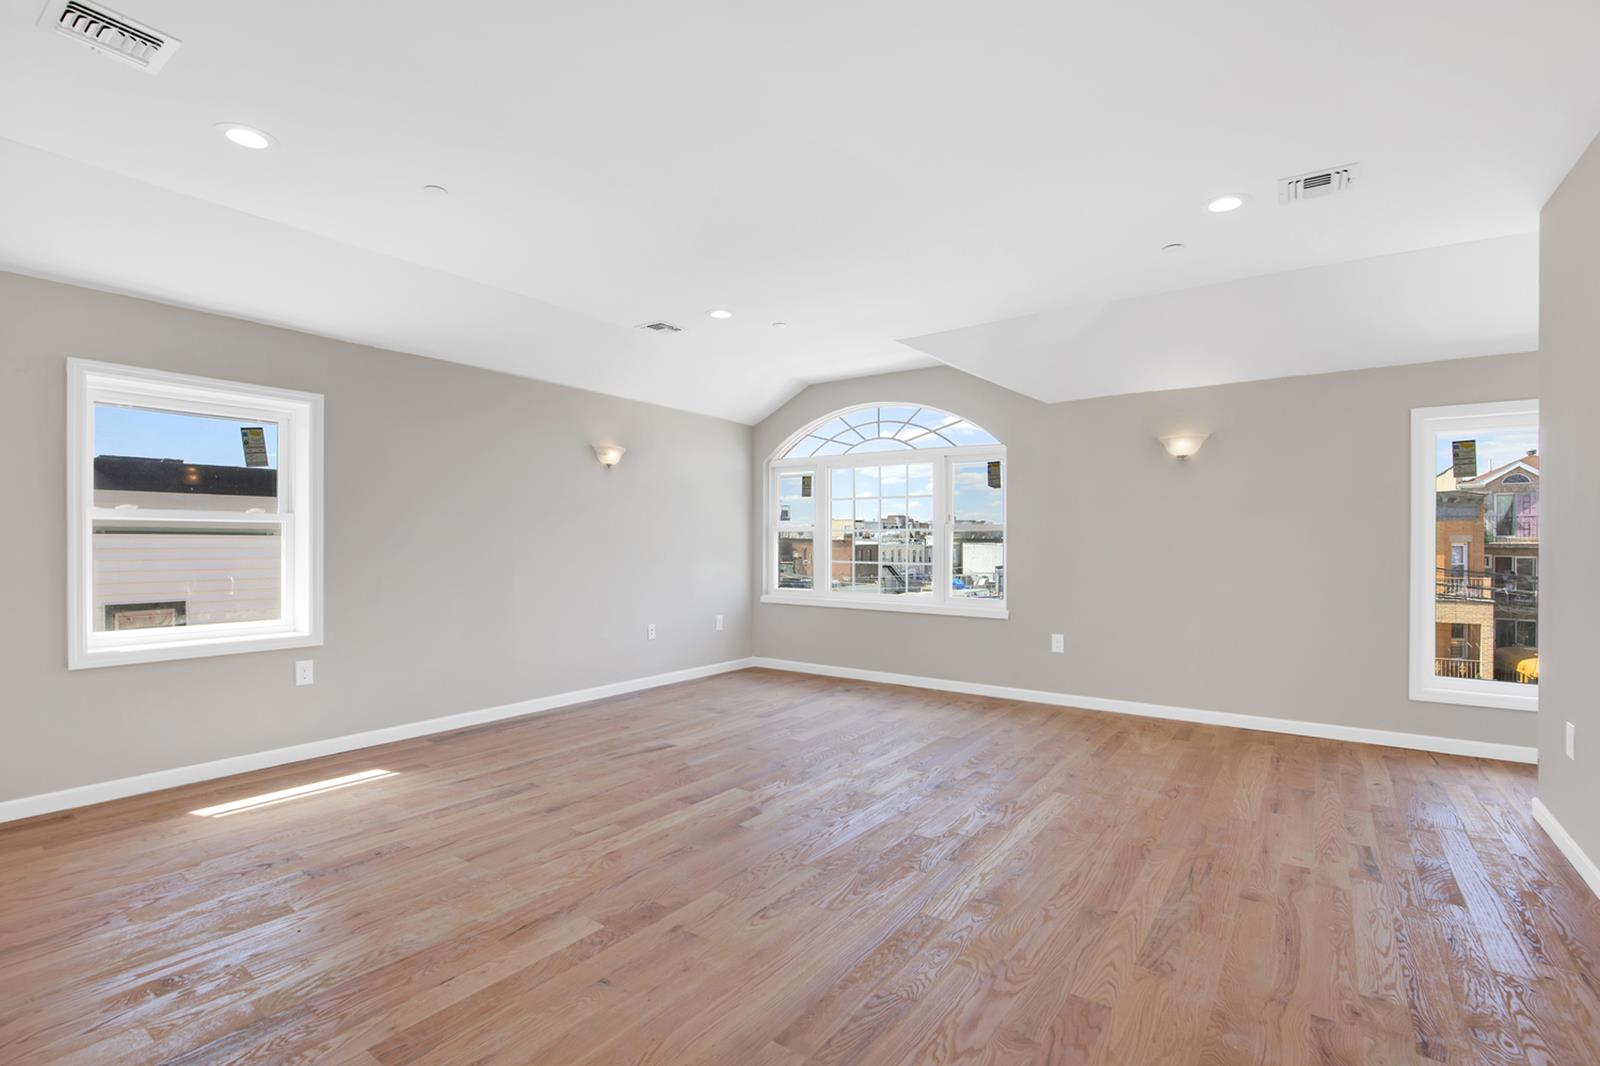 32-37 100th Street East Elmhurst Queens NY 11369